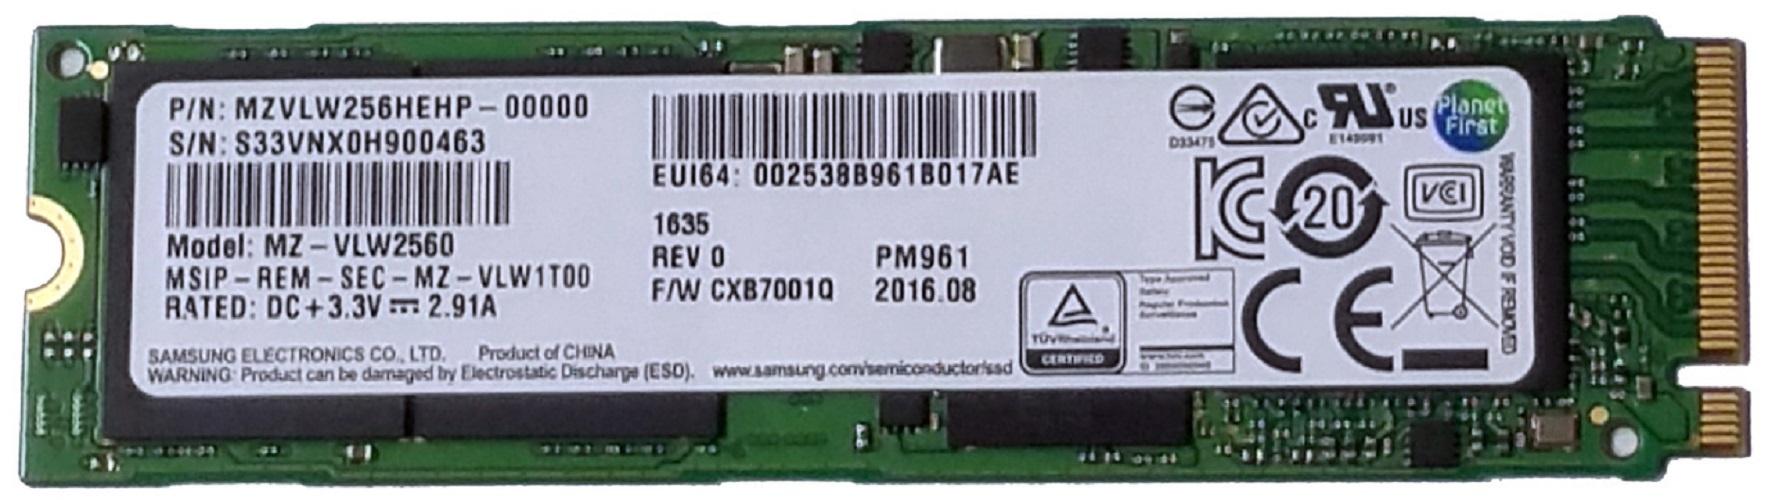 Samsung Pm961 256gb M2 Ngff Pcie Gen3 X4 Nvme Solid State Drive Sm961 2280 Ssd 1tb Oem